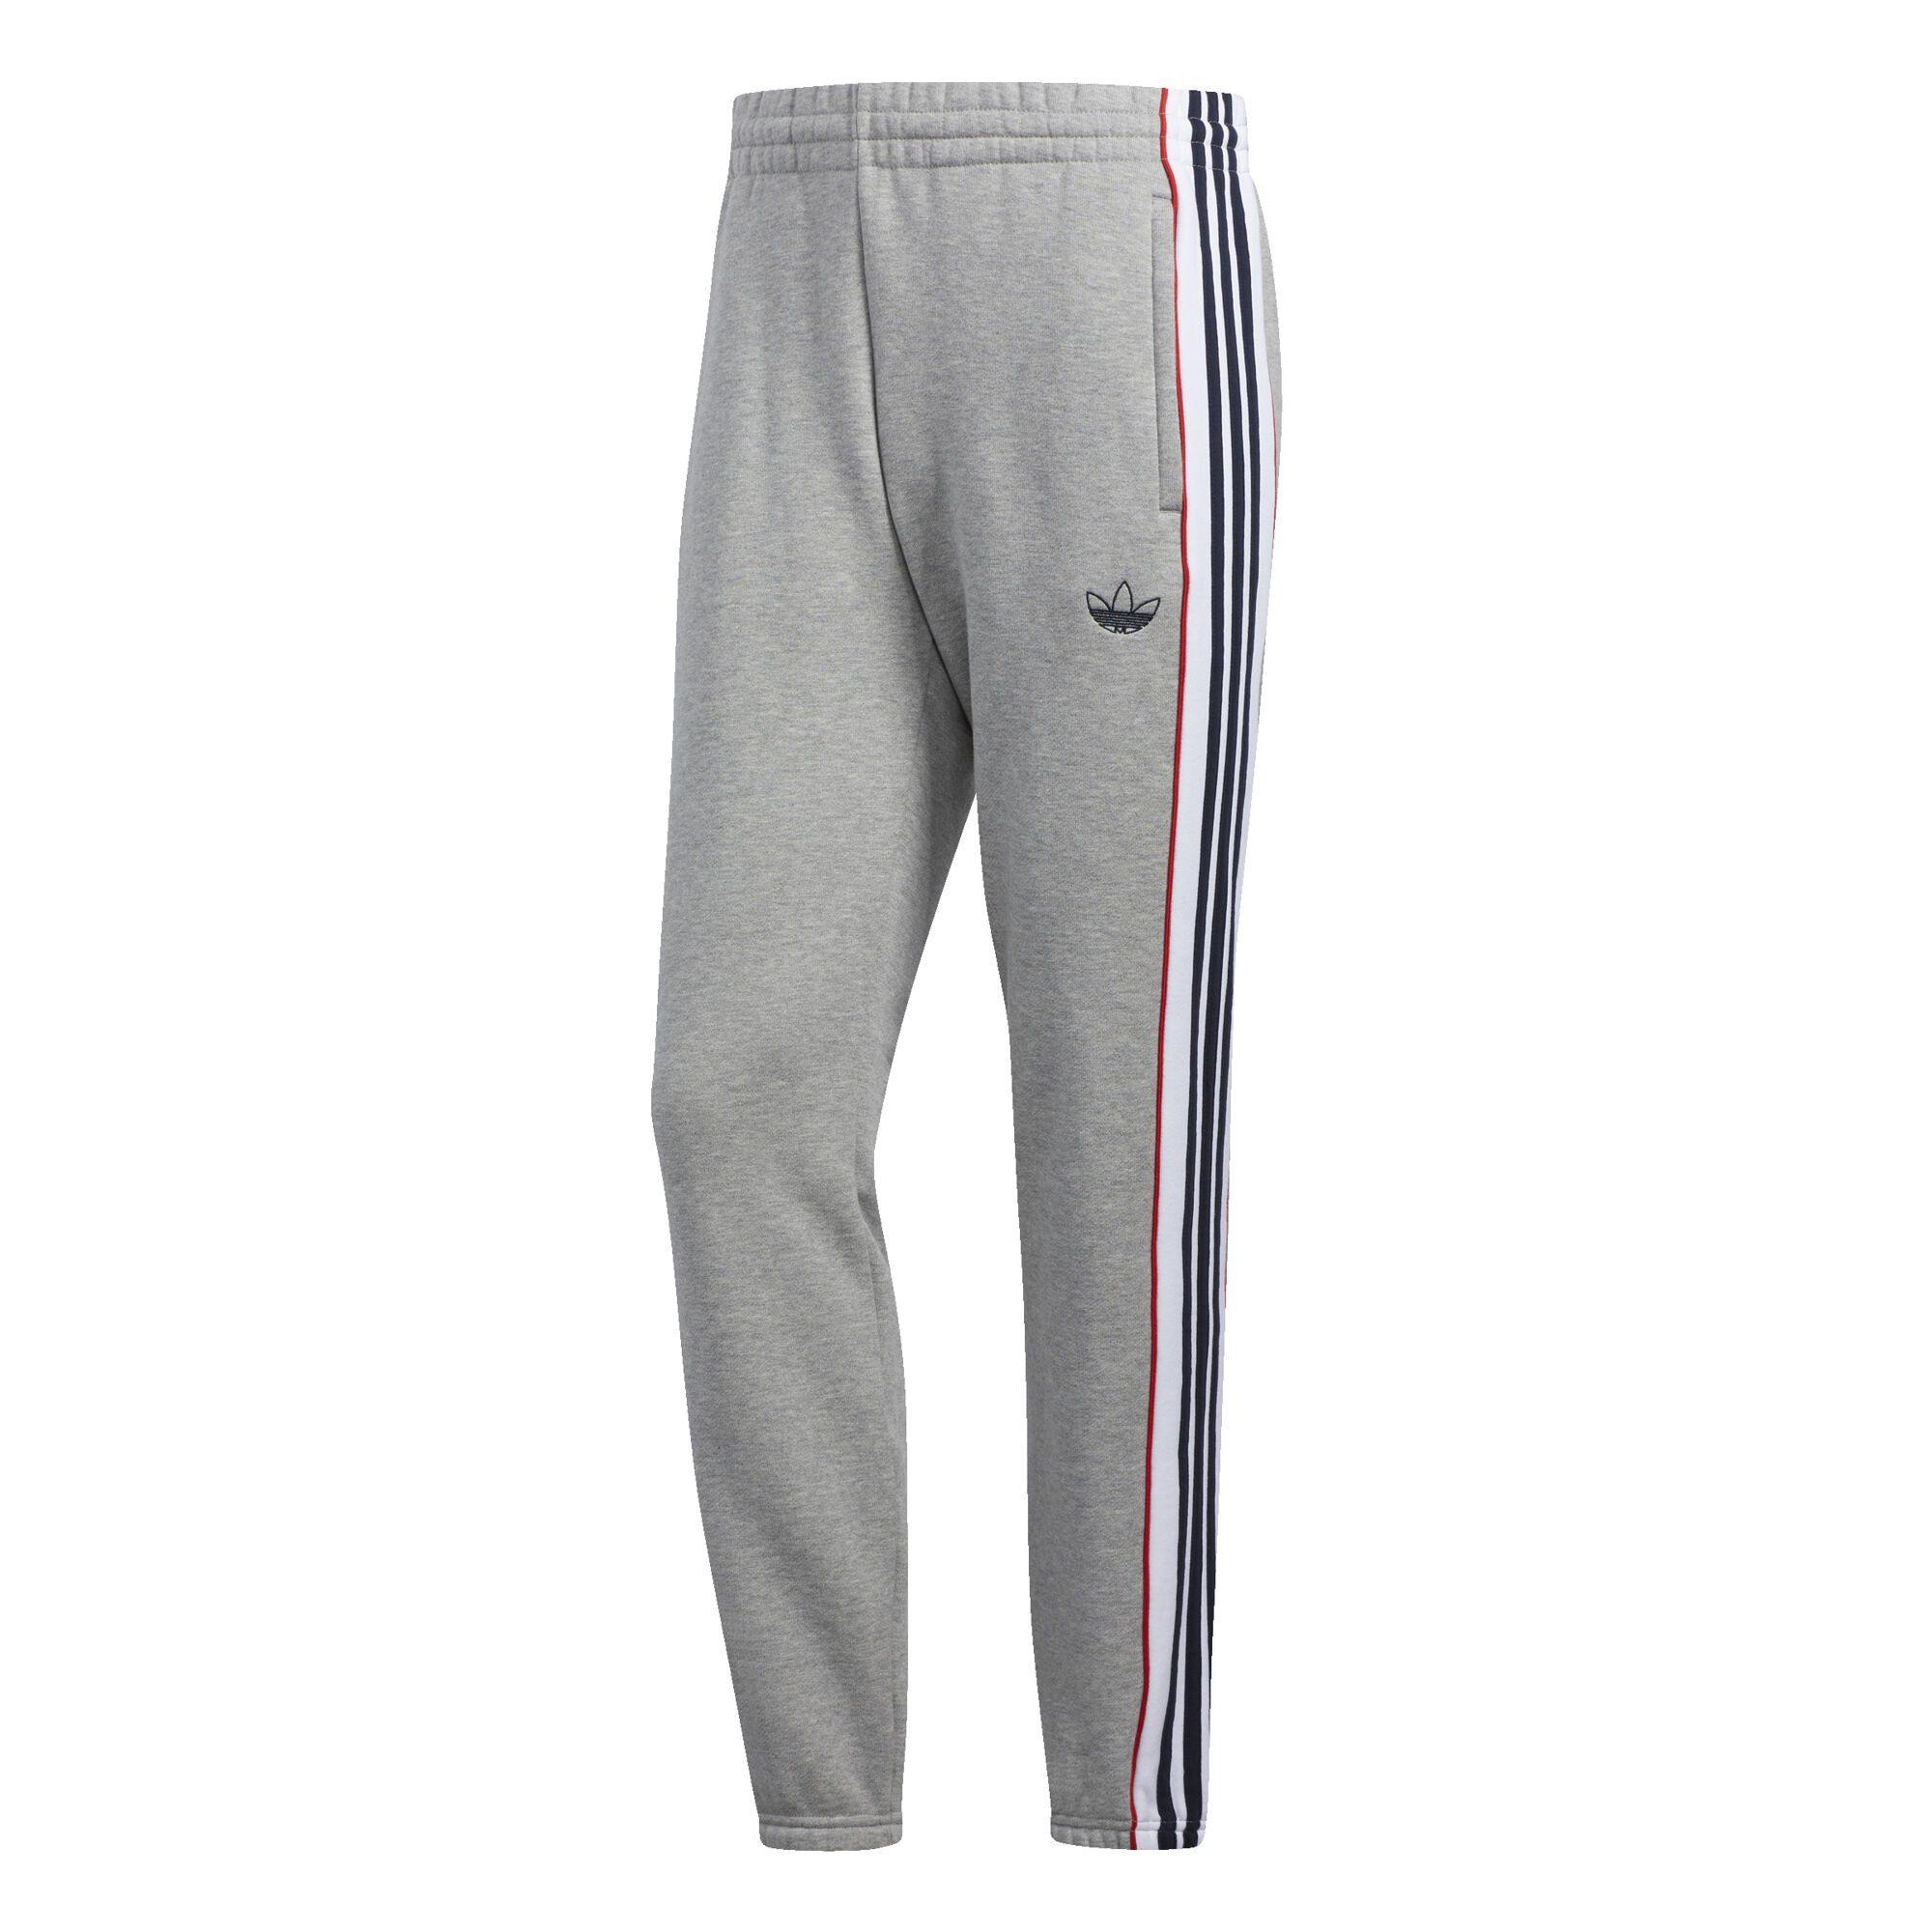 adidas Originals Sporthose »3 Stripes Panel Joggers« online kaufen   OTTO